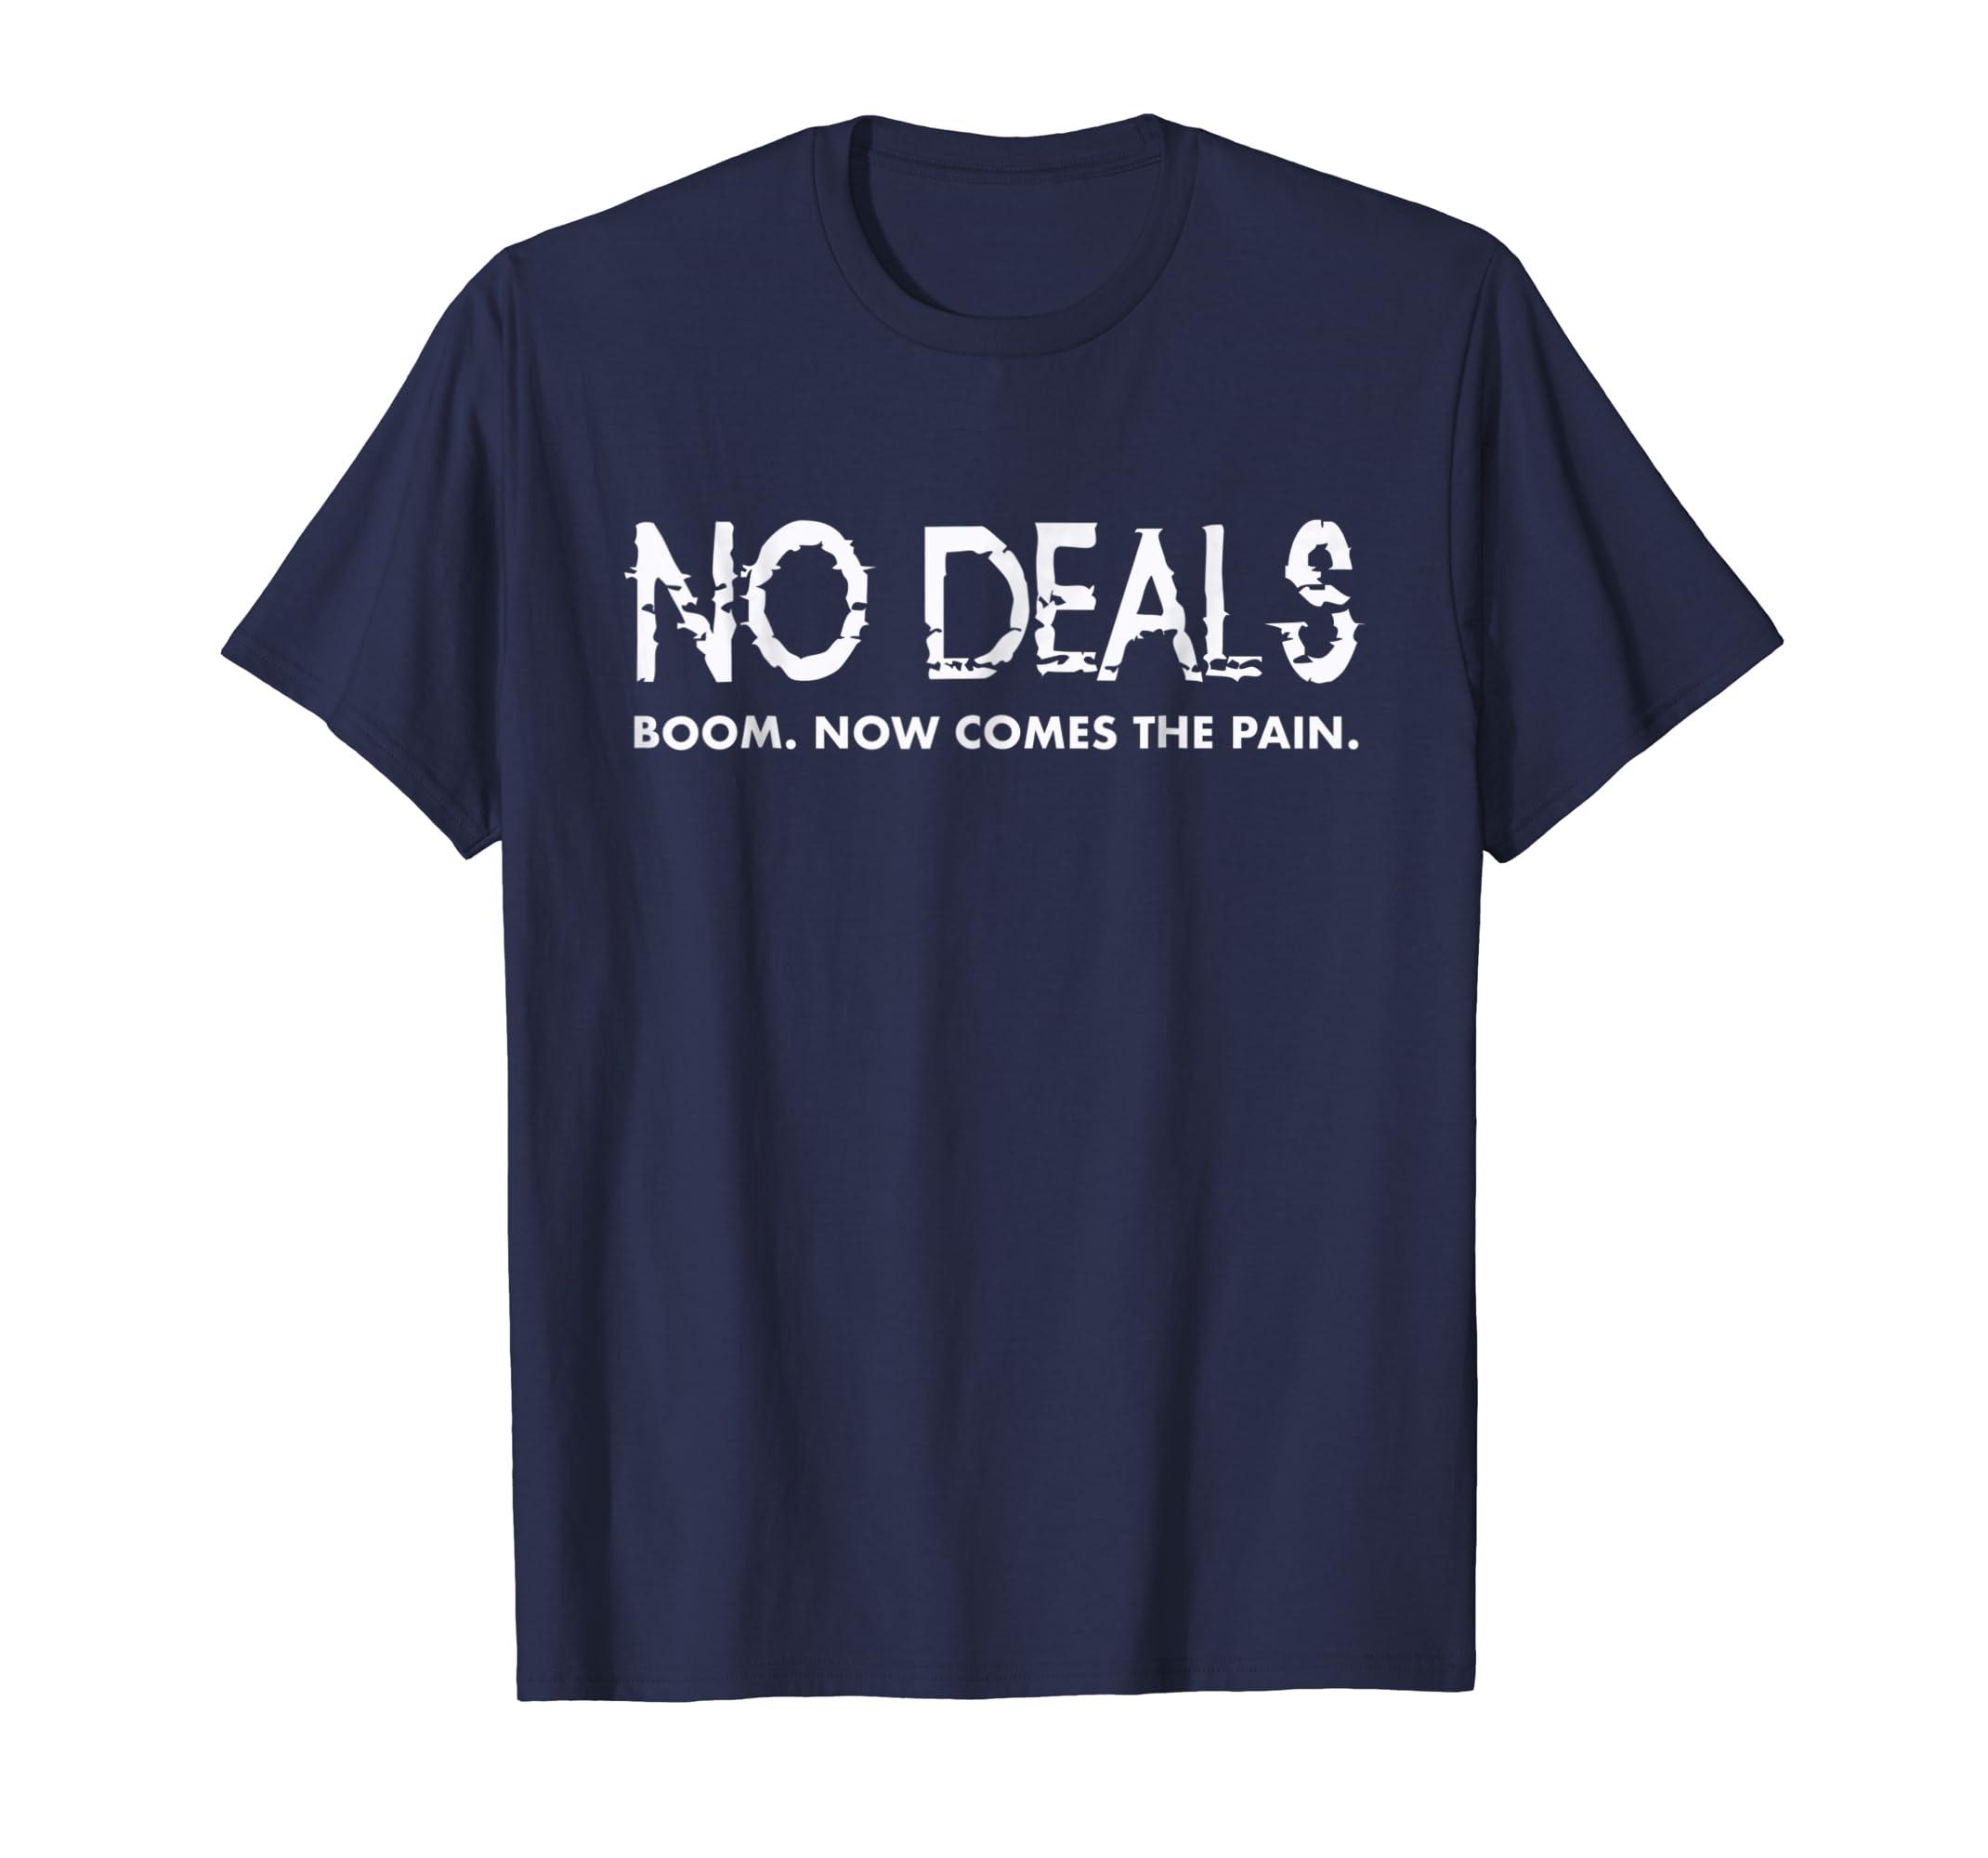 Qanon No Deals Boom Now Comes the Pain Shirt-ln